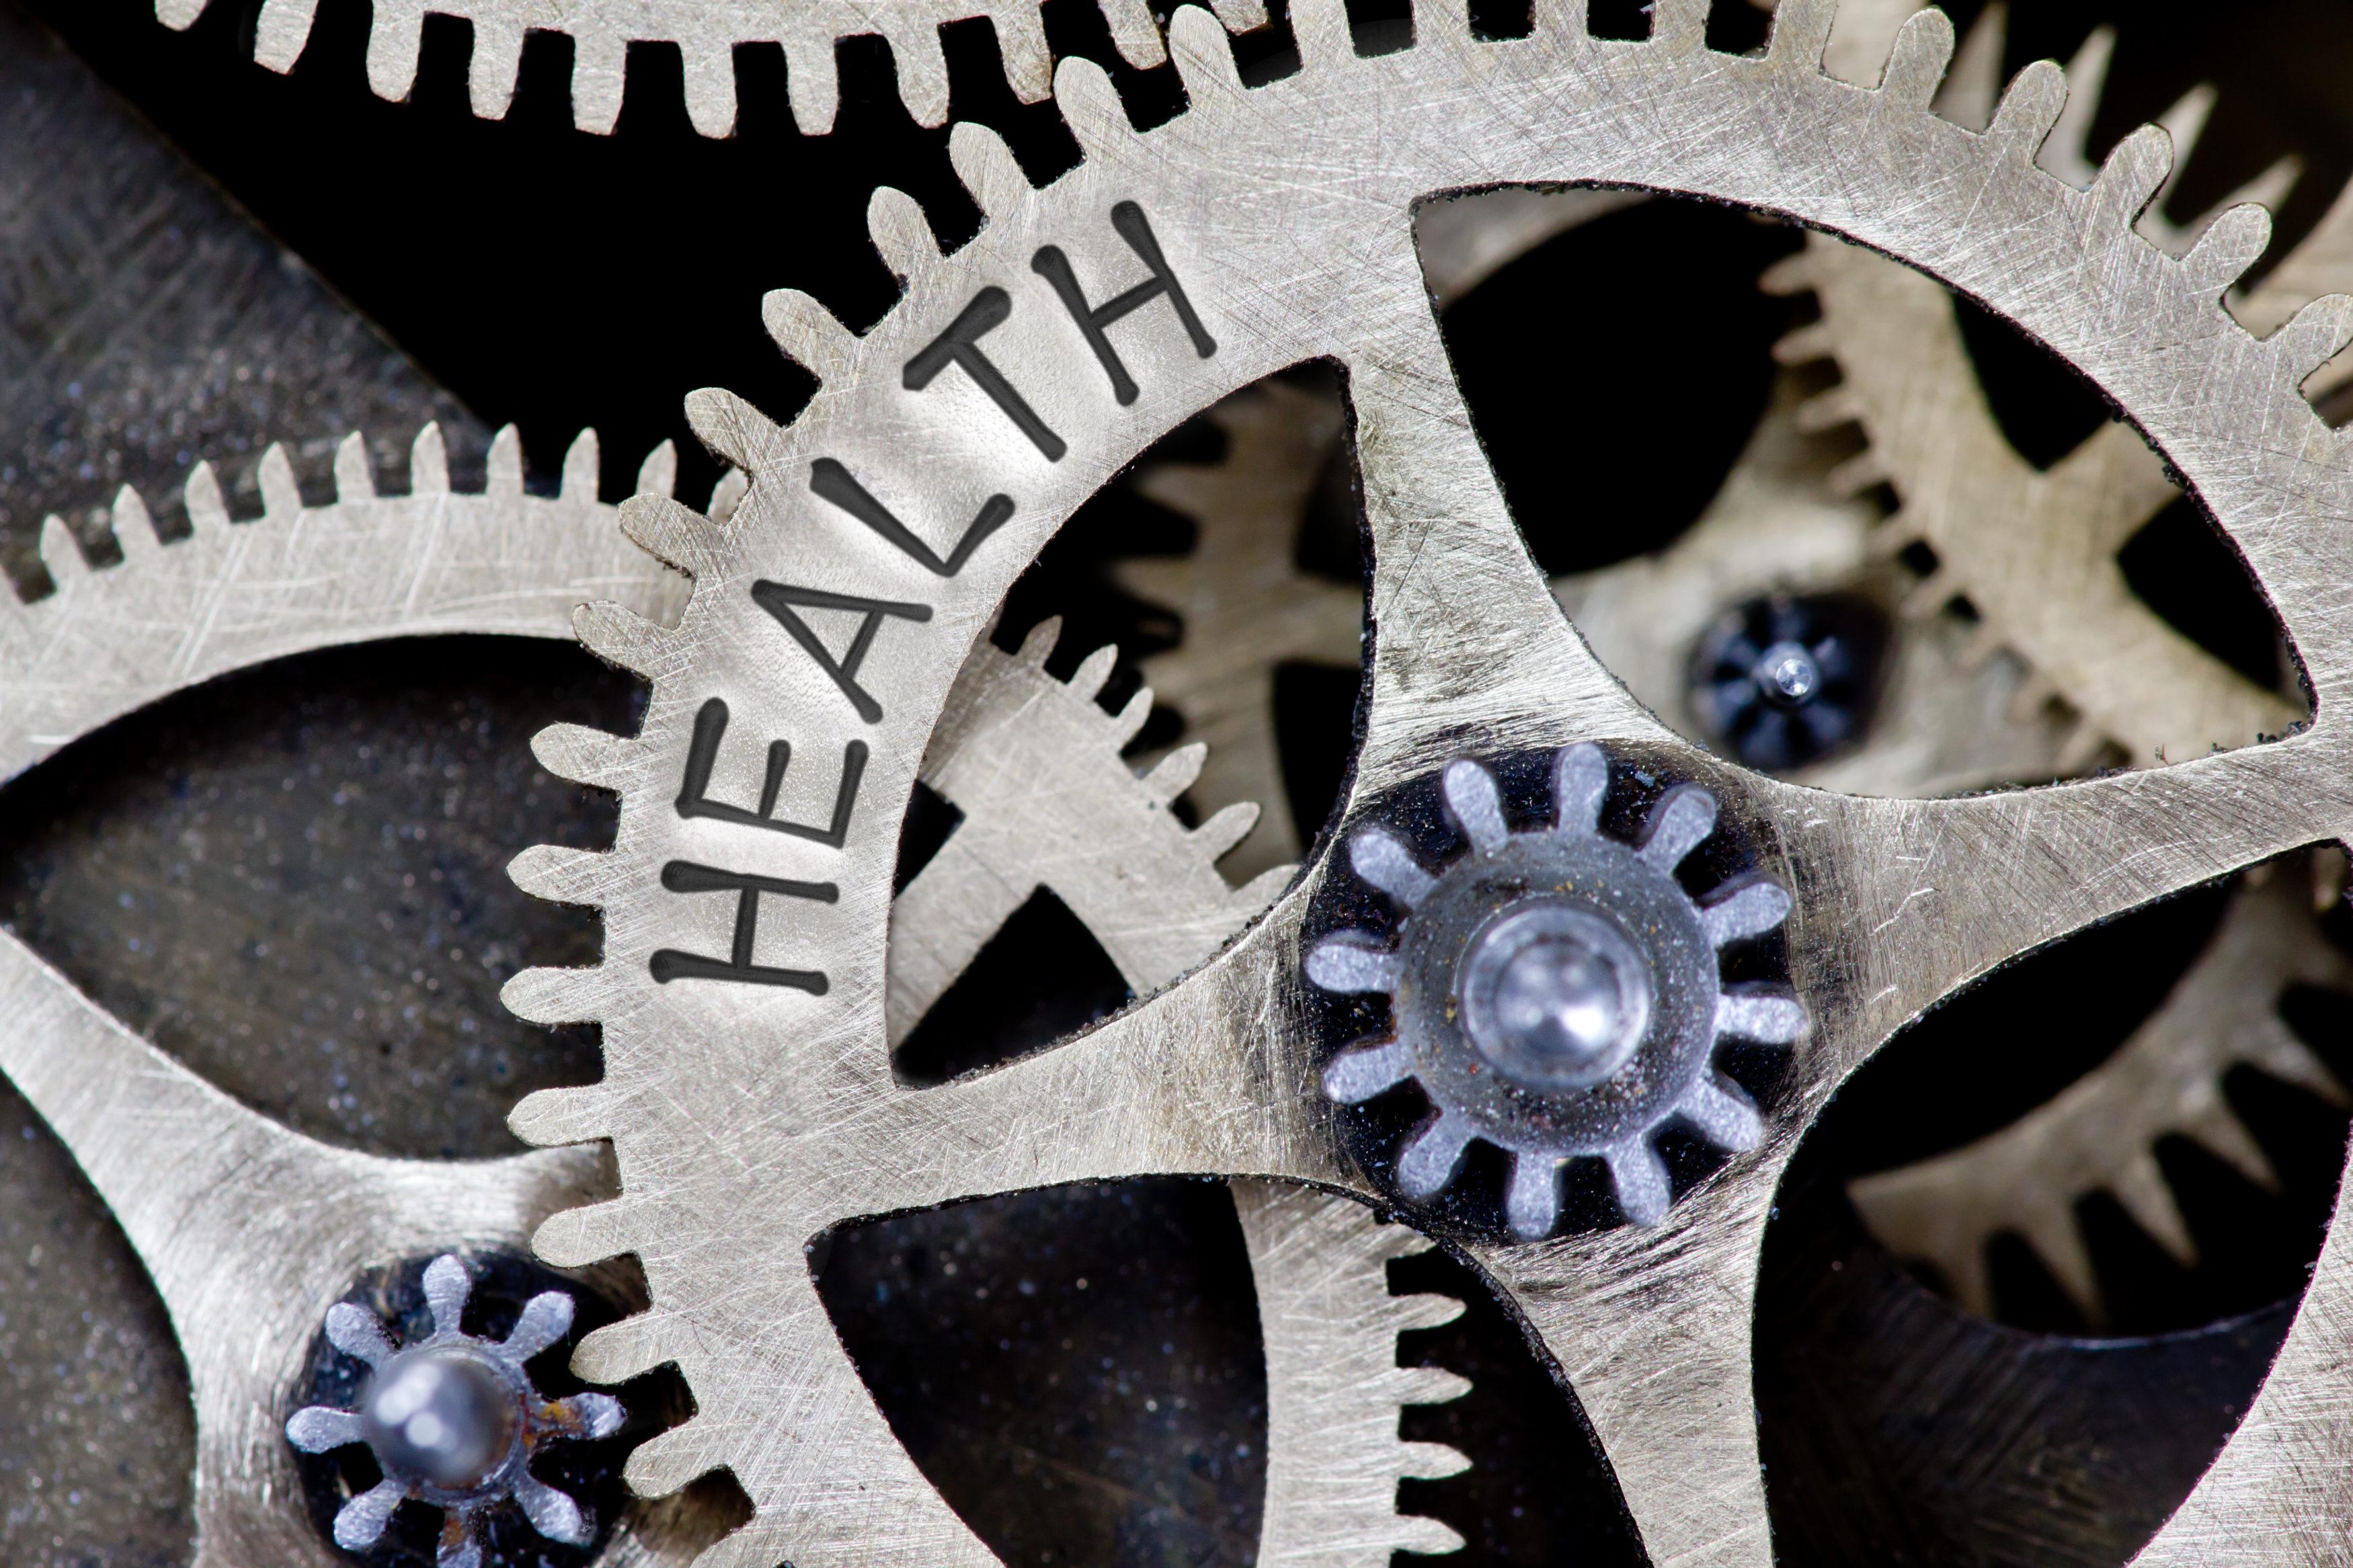 health-care-3500x2333.jpeg